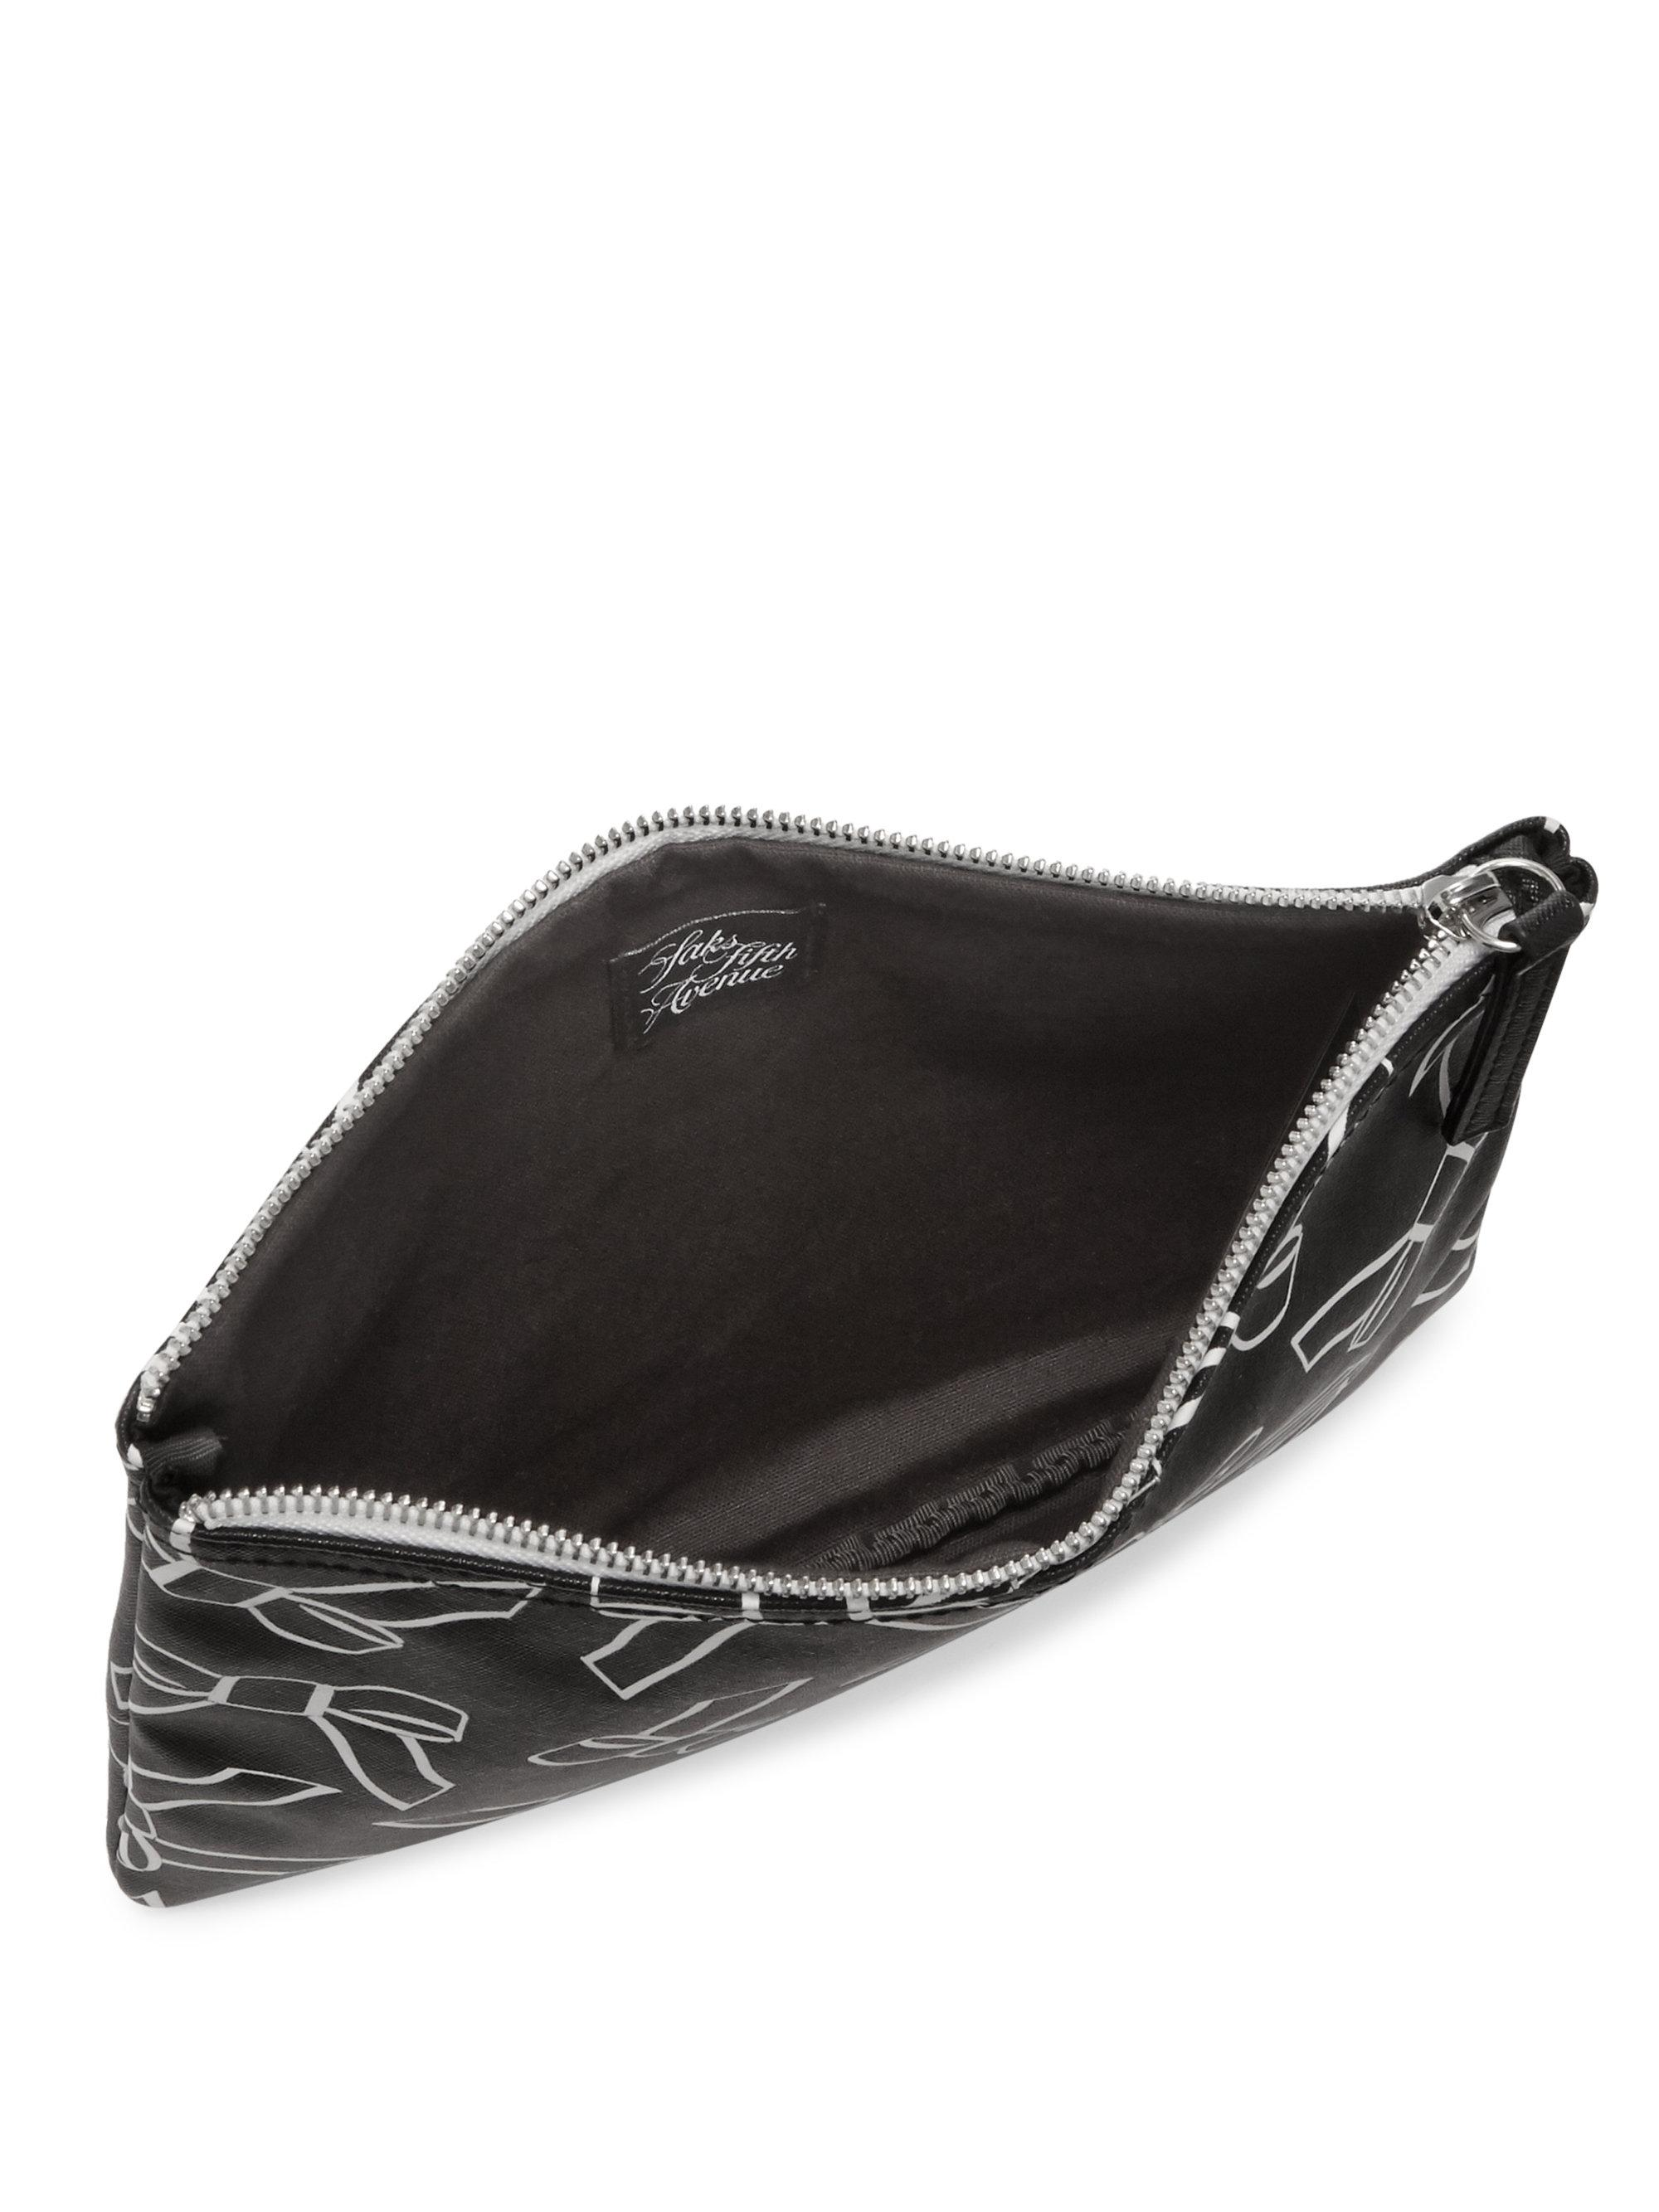 Louis Vuitton Handbags Saks Cincinnati Best Handbag 2018 Fifth Avenue